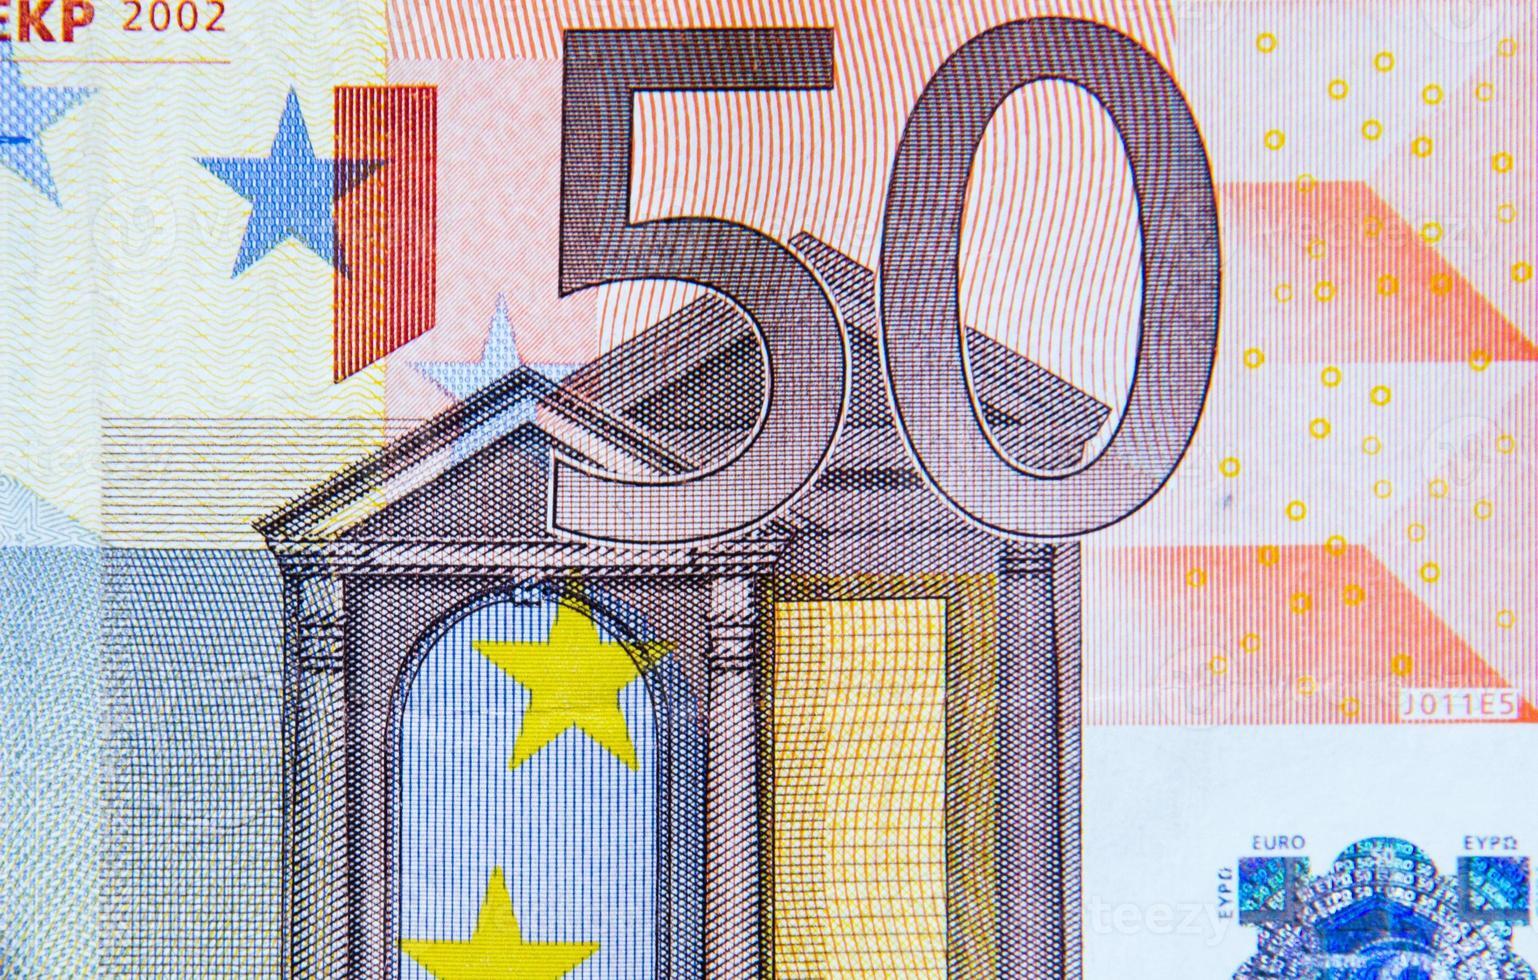 Billete de 50 euros foto